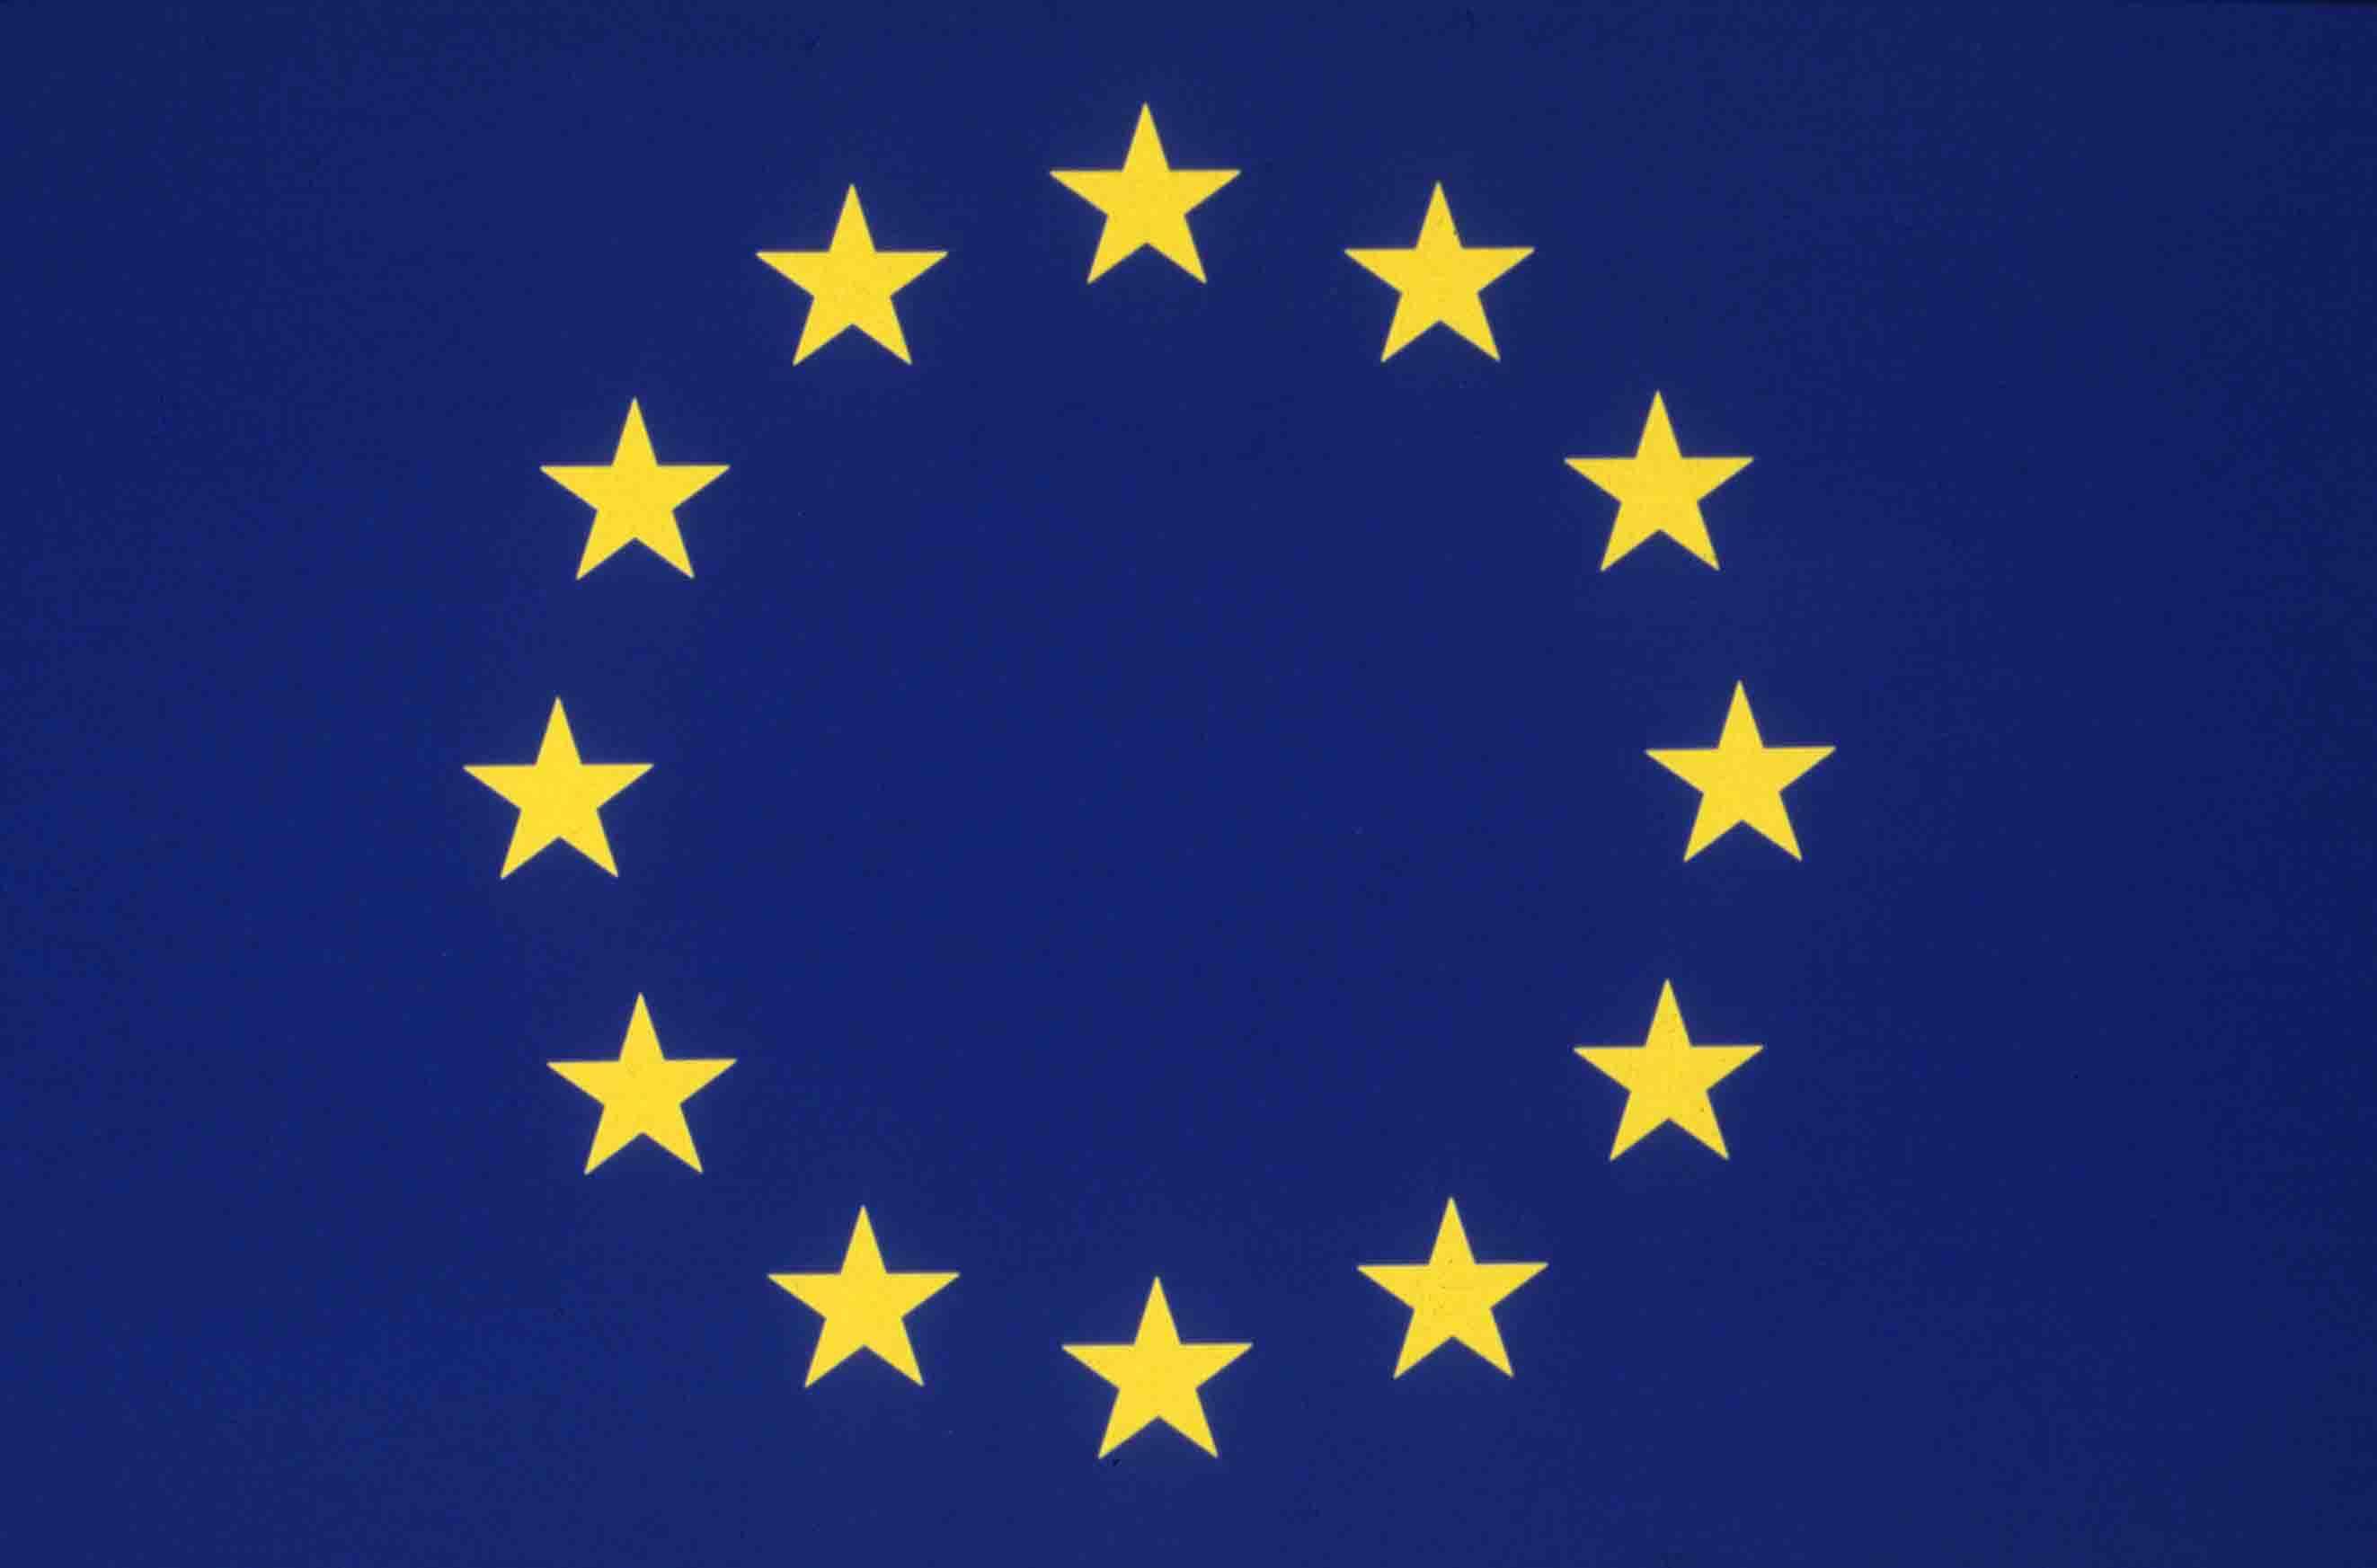 Bandiera d'Europa